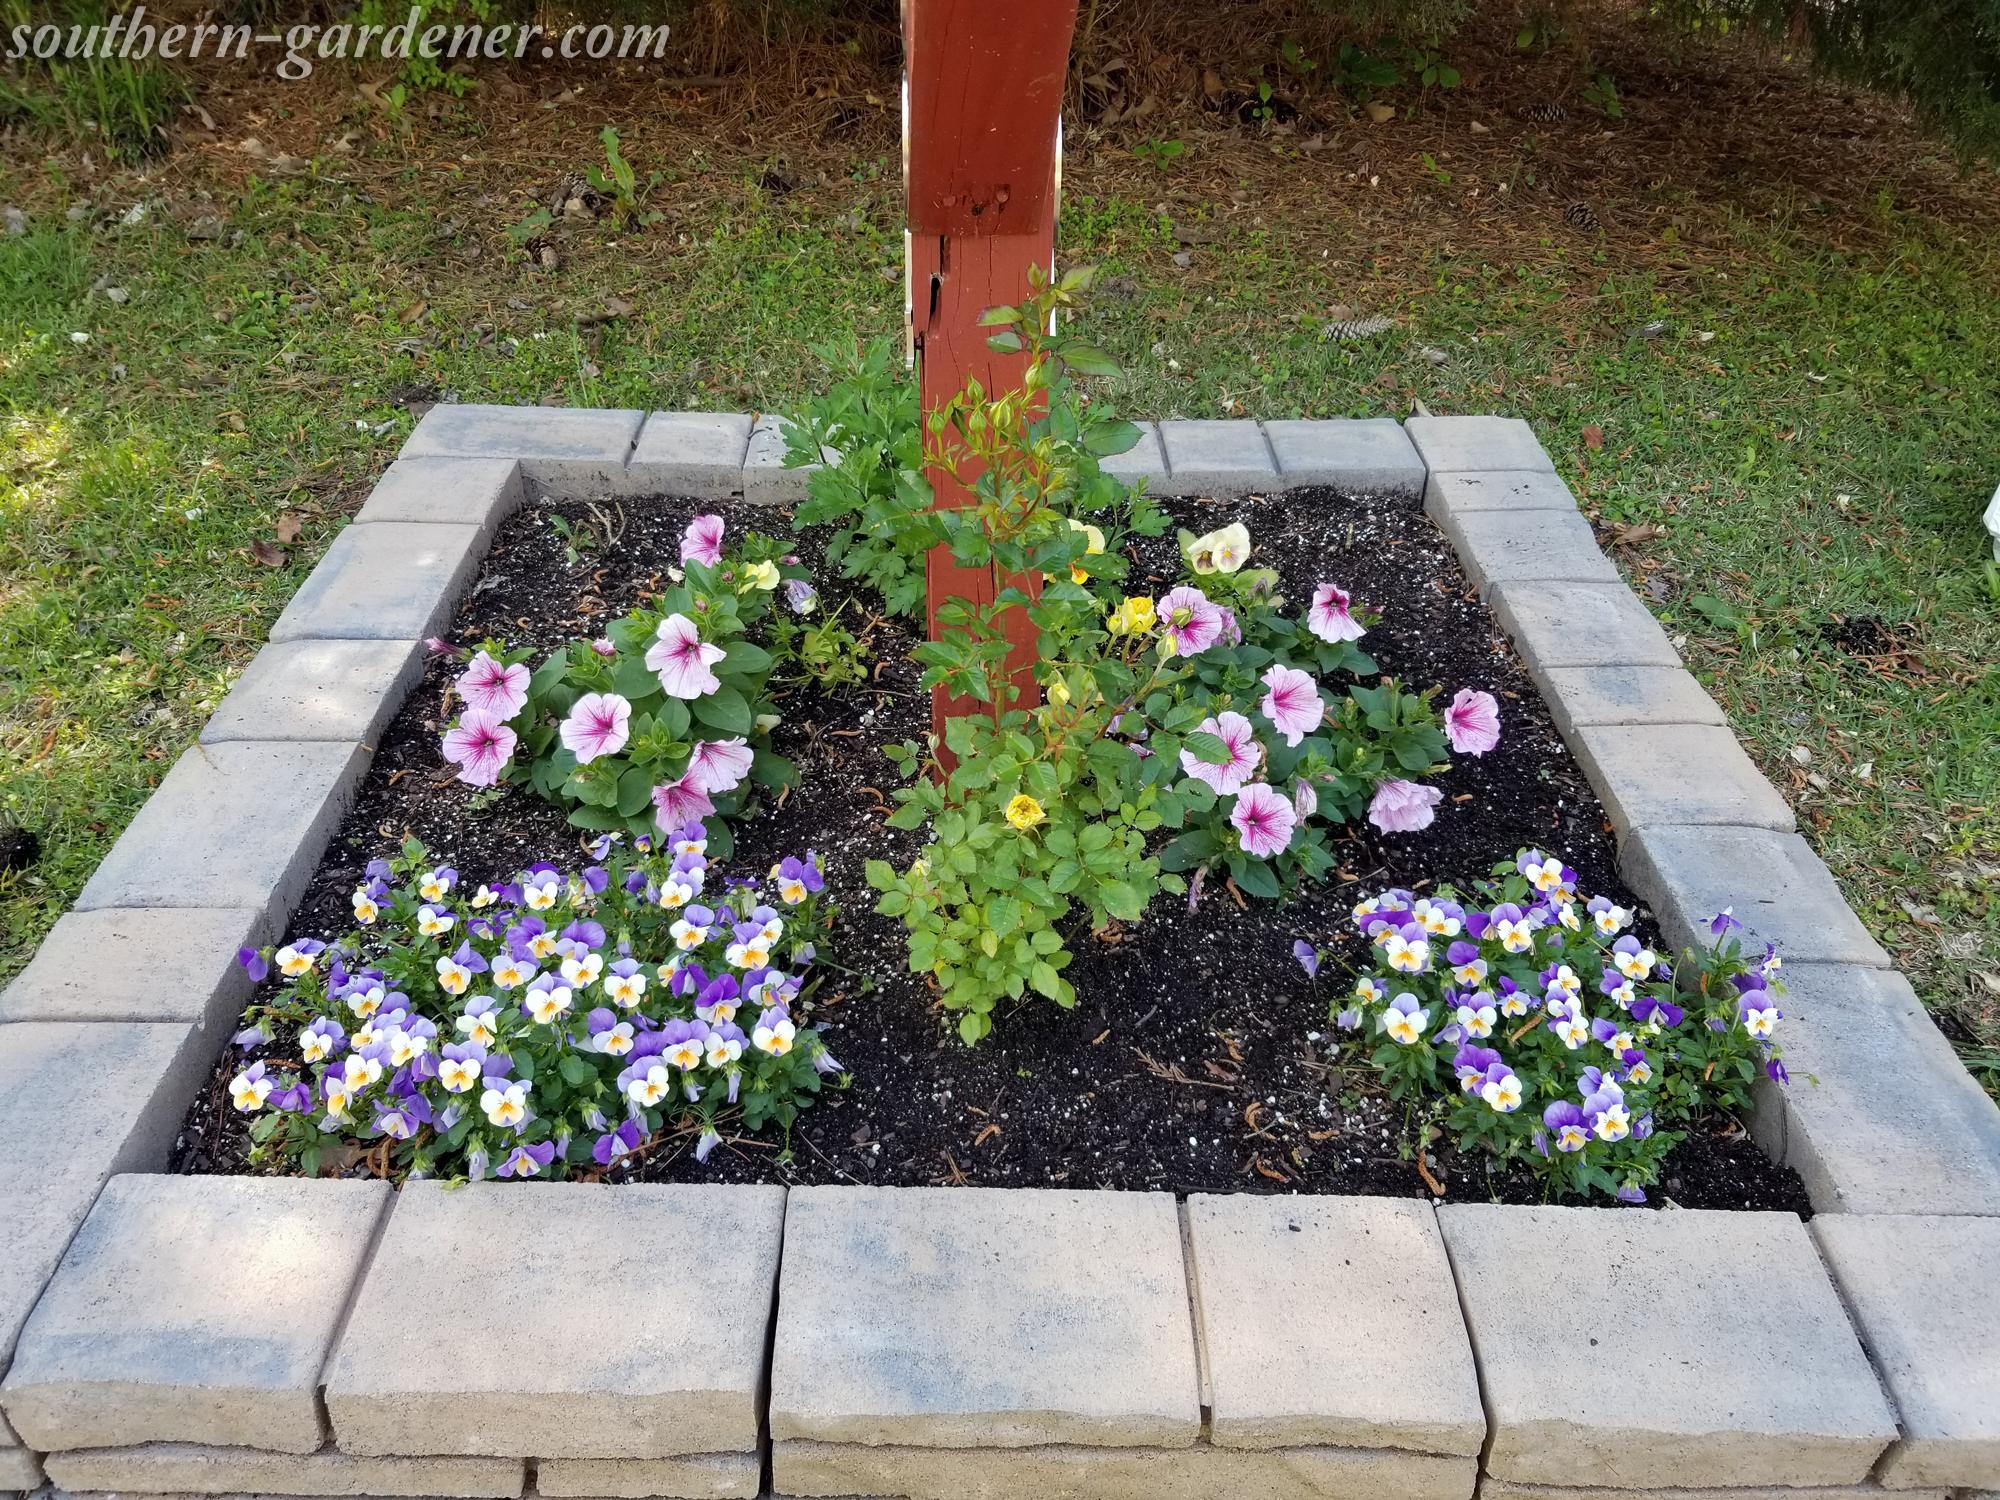 mailbox landscaping: violas, petunias, miniature rose bush